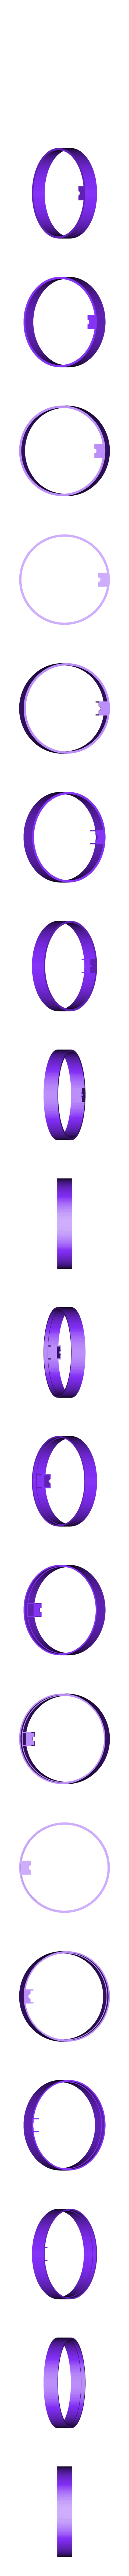 ROUND.stl Download free STL file Time is time is time • Design to 3D print, JeremyBarbazaStudio